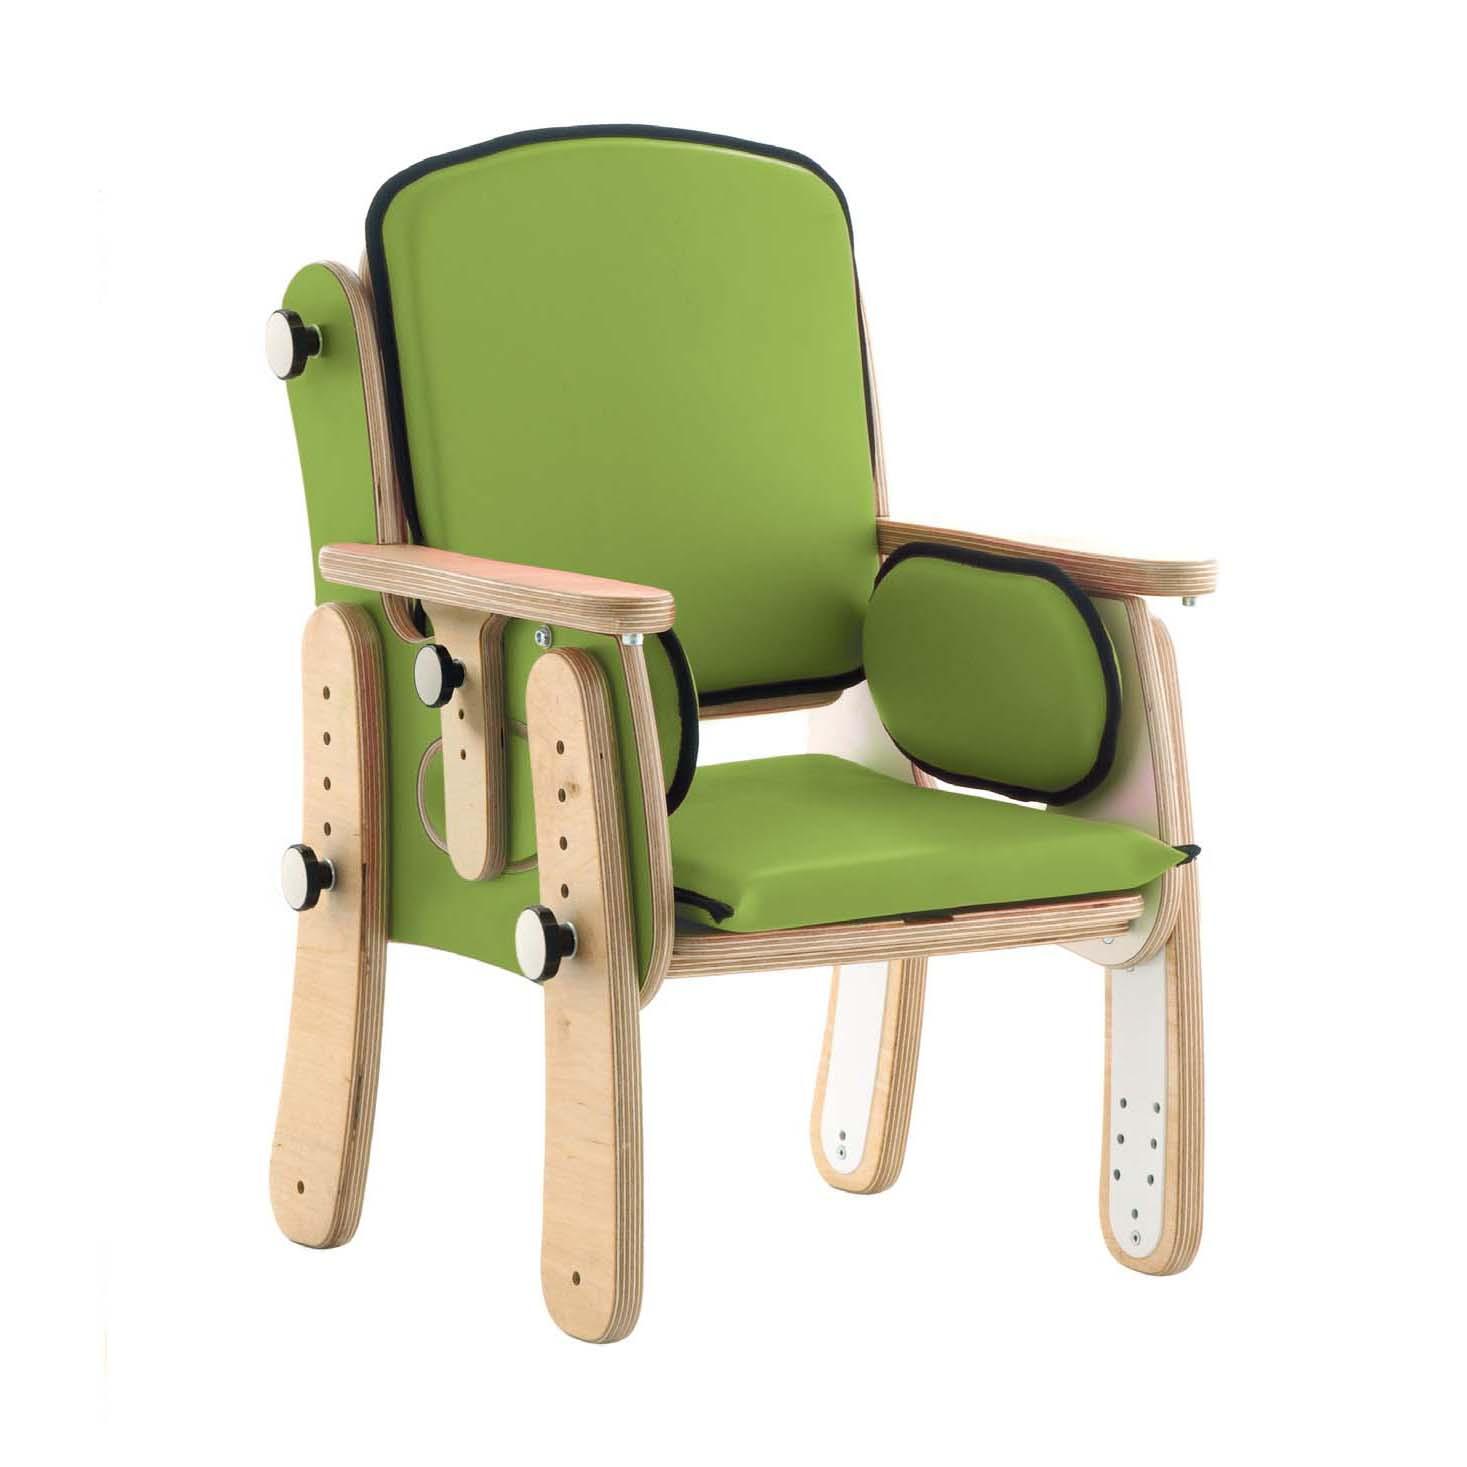 Leckey PAL classroom seat